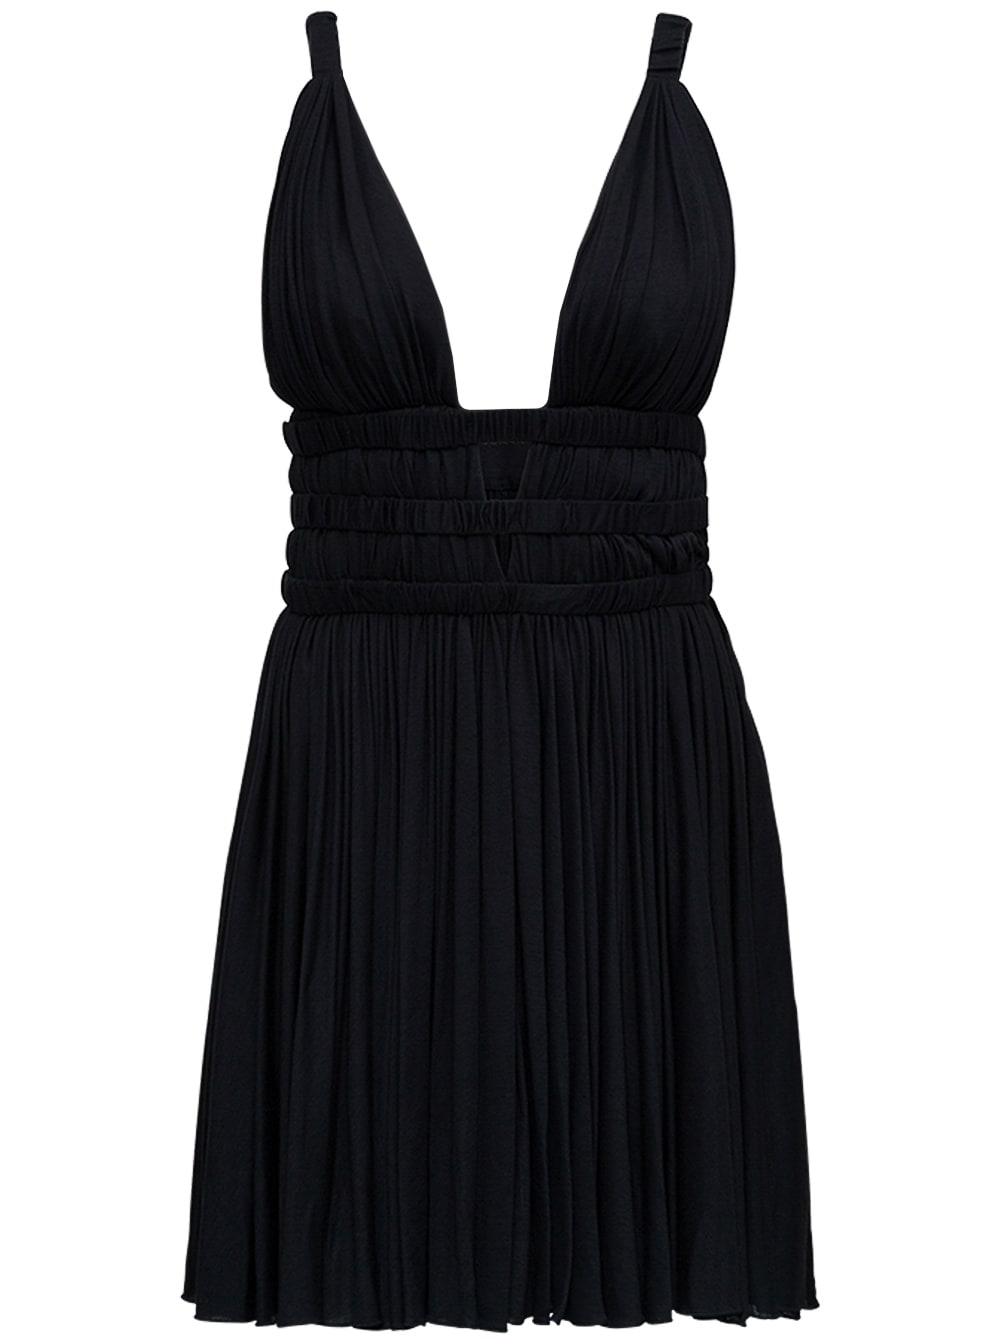 Black Pleated Jersey Dress With Deep V-neckline